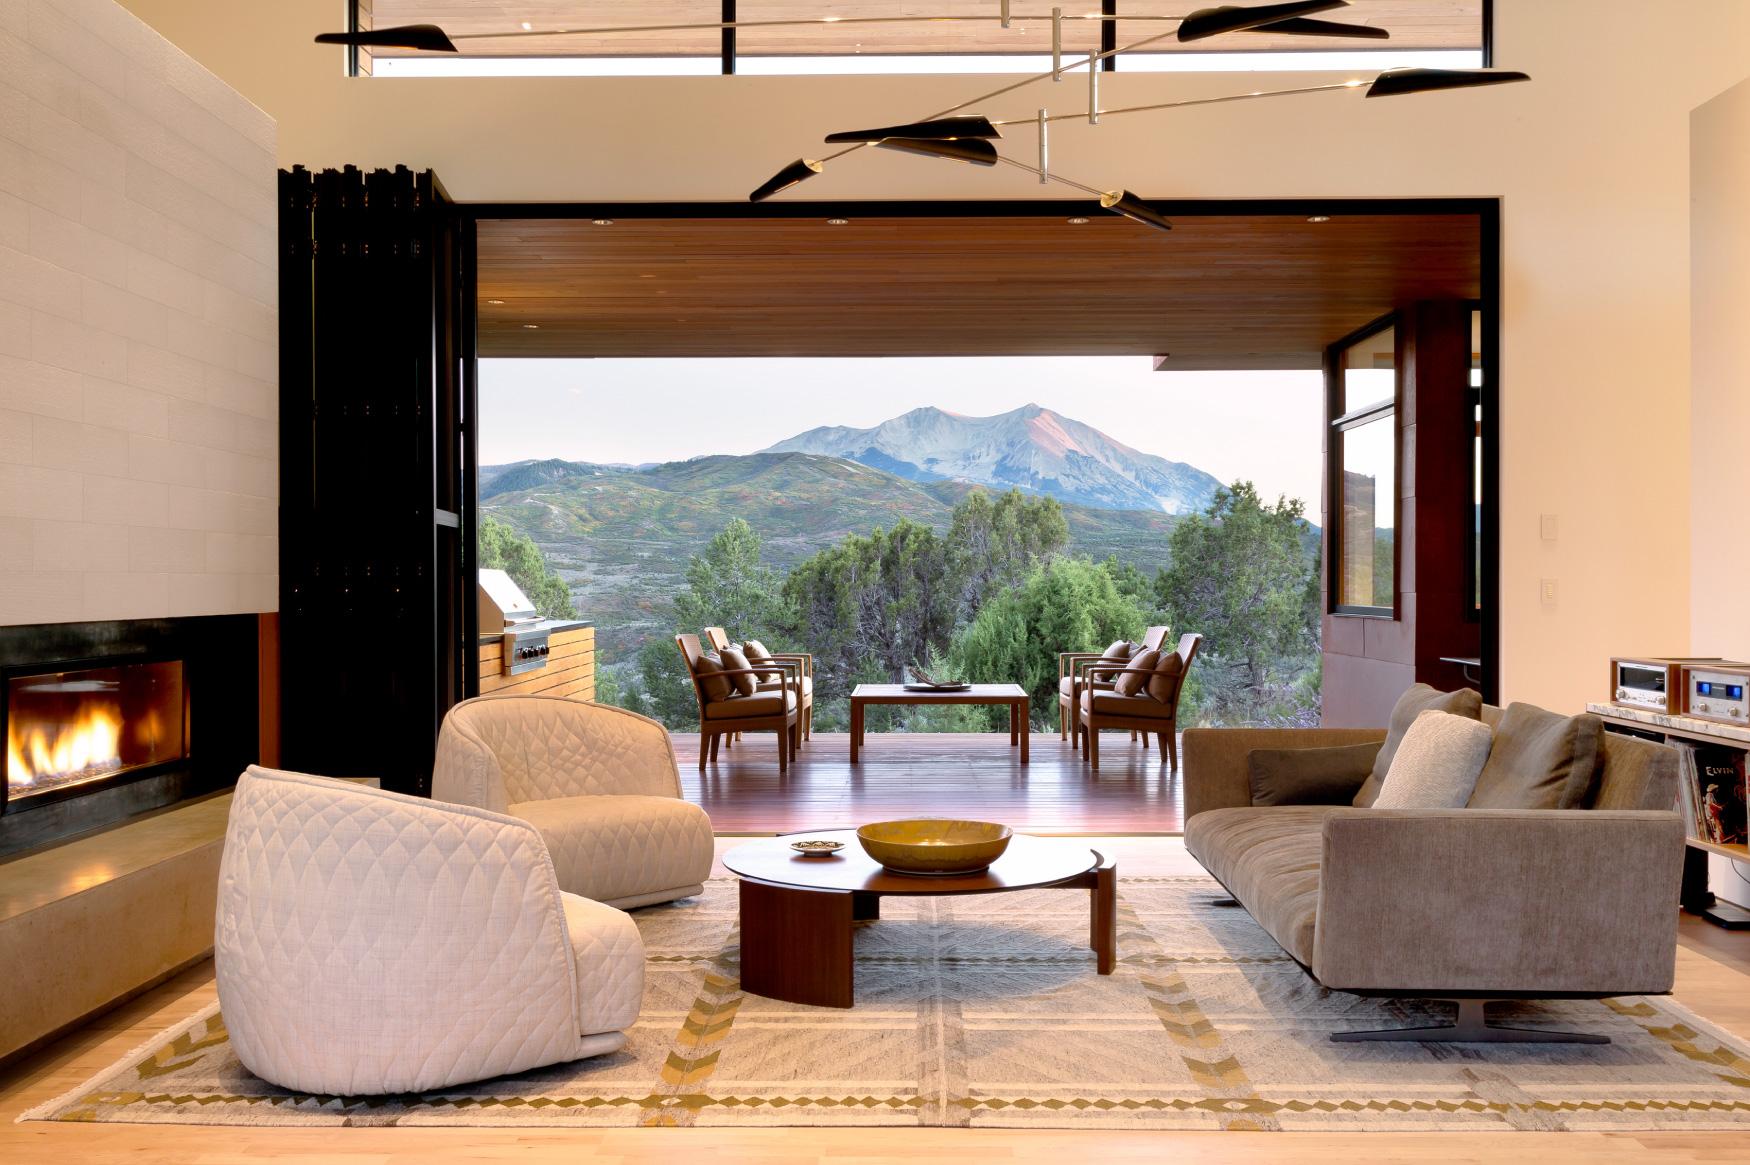 studio collins weir interior design studiocollinsweir mountainhome 2 jpg